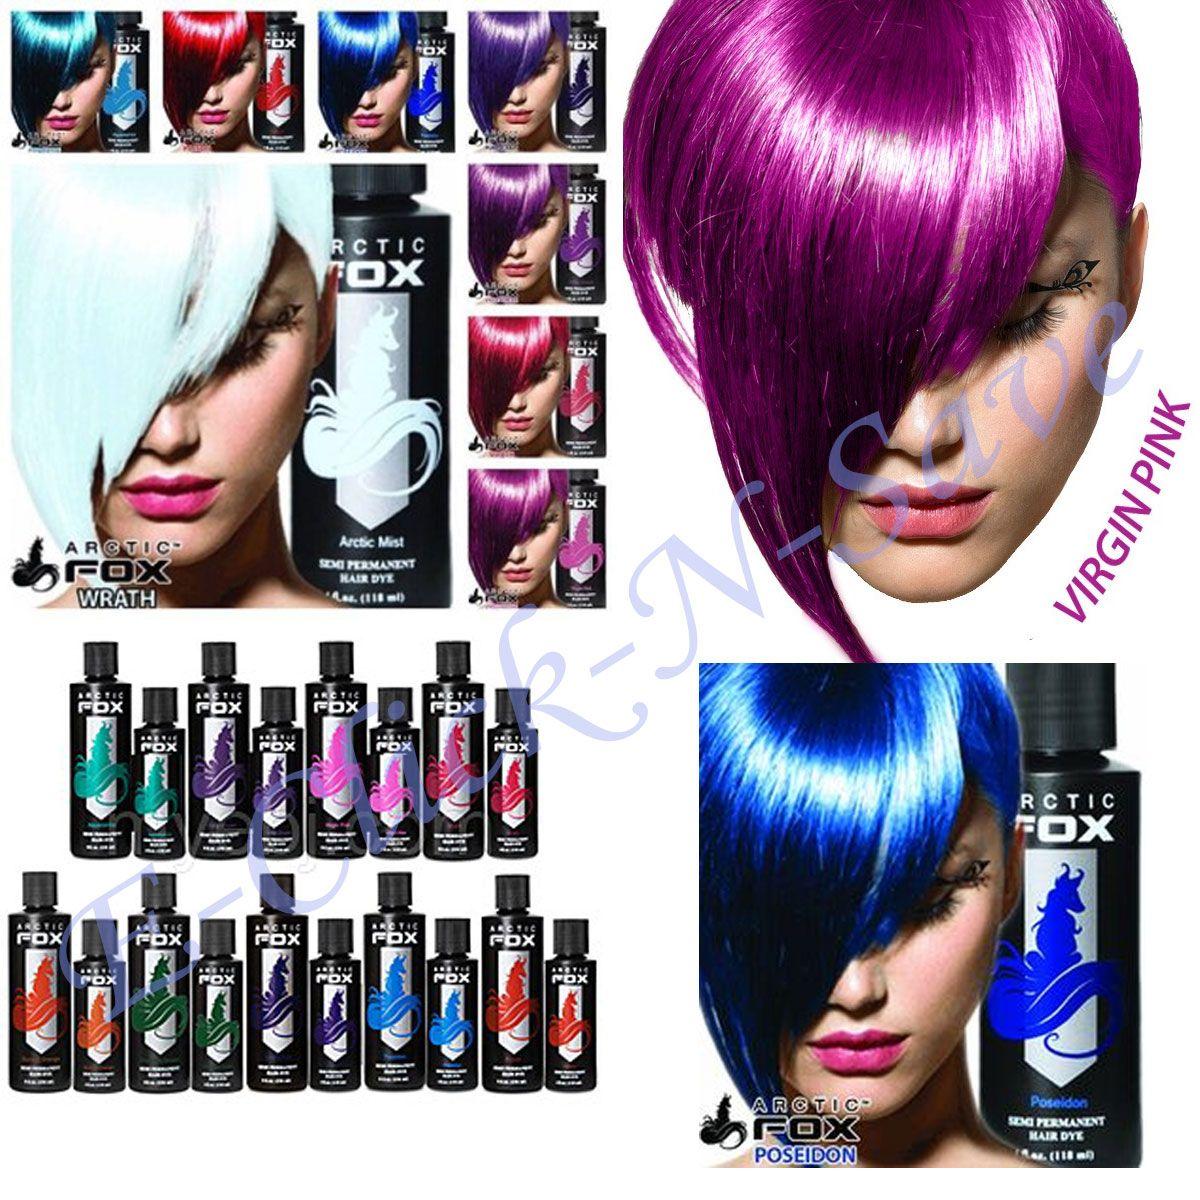 Artic Color Hair Dyeg Arctic Fox Hair Color Is Cruelty Free Semi